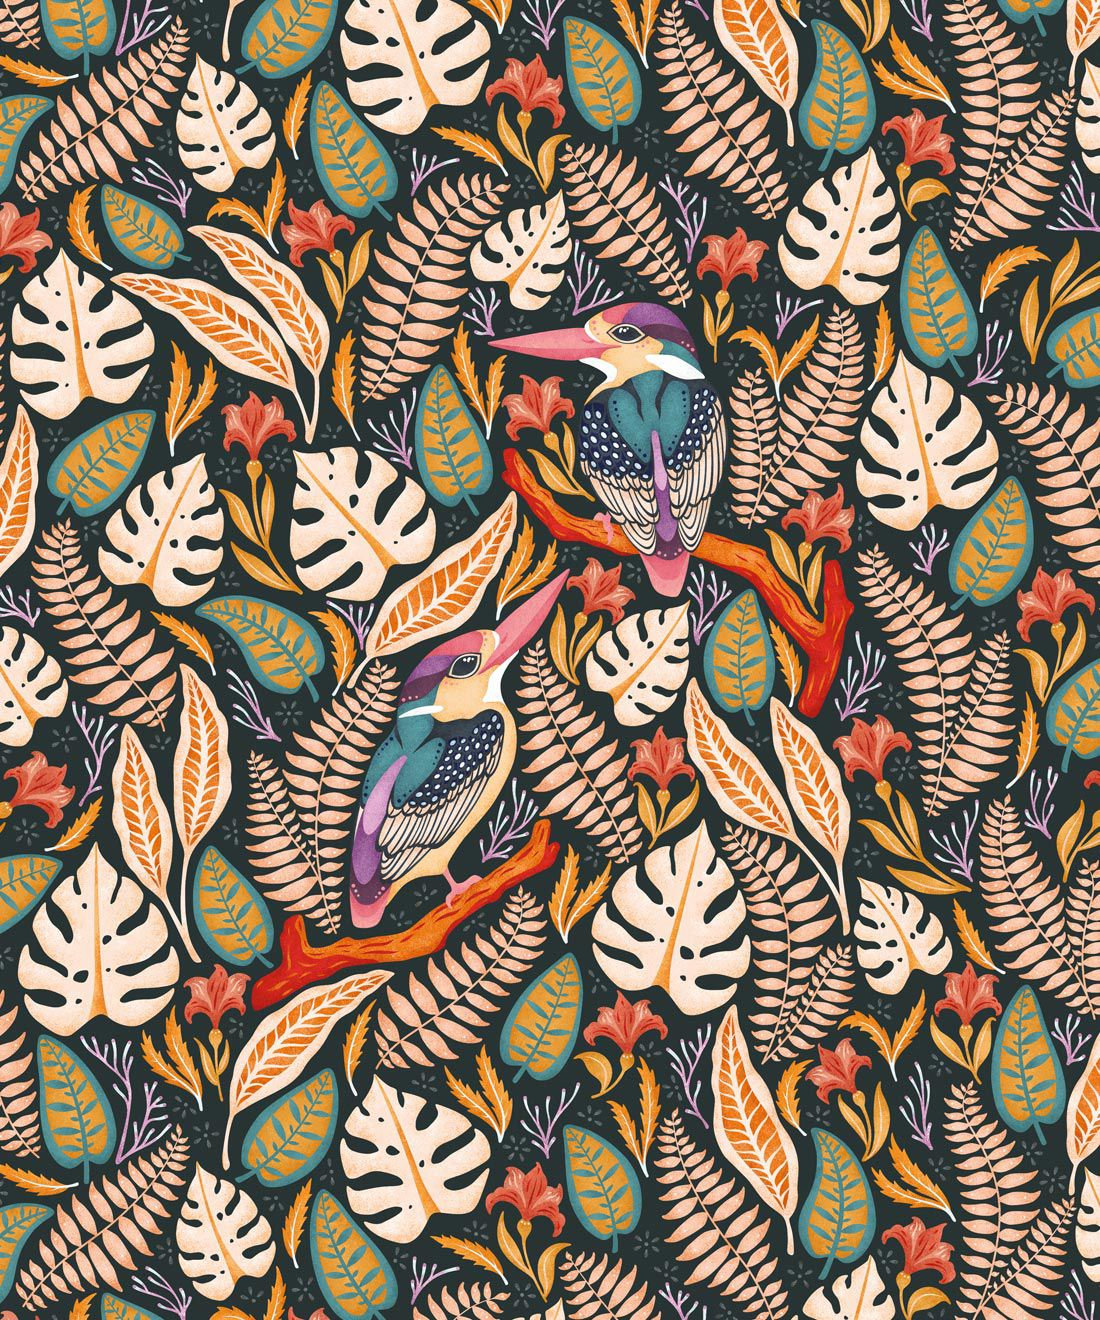 Kingfisher Wallpaper • Bird Wallpaper •Autumn Color Wallpaper